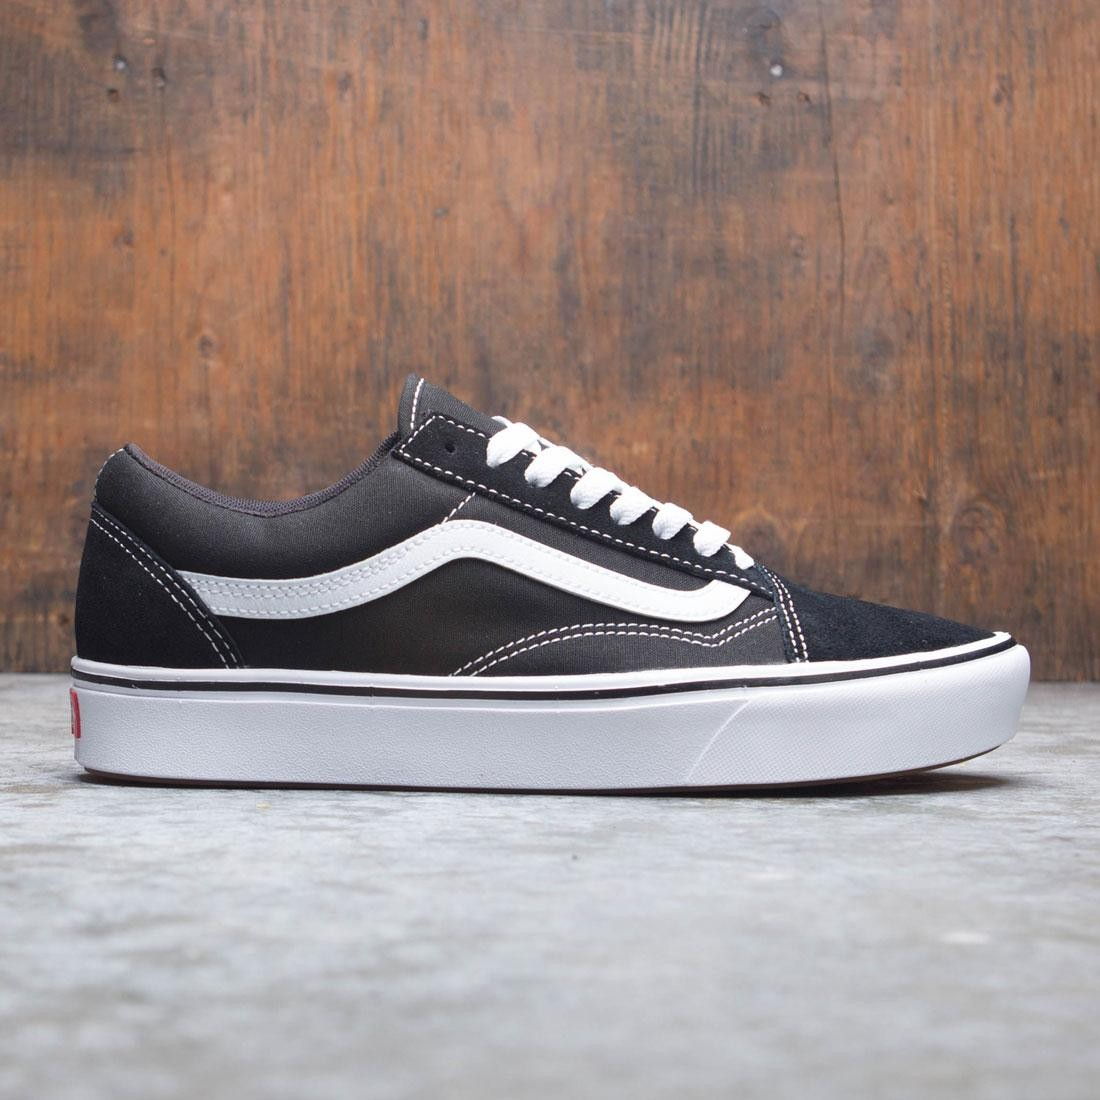 Vans Men Old Skool - Comfy Cush black white